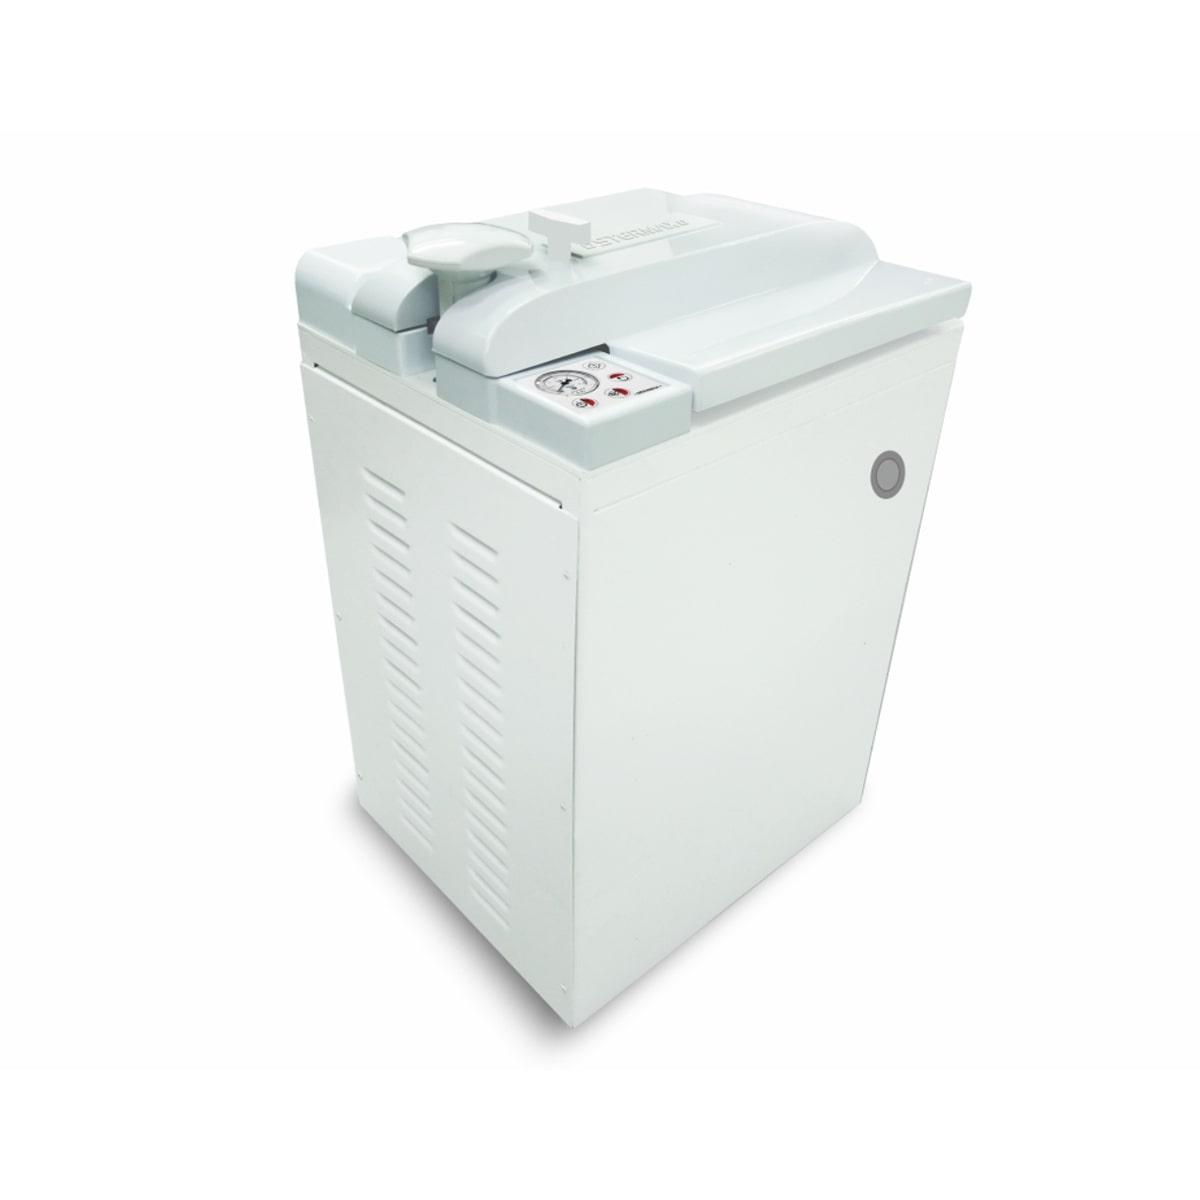 Autoclave Vertical Analógica Gravitacional Normal Box 60 litros  Stermax